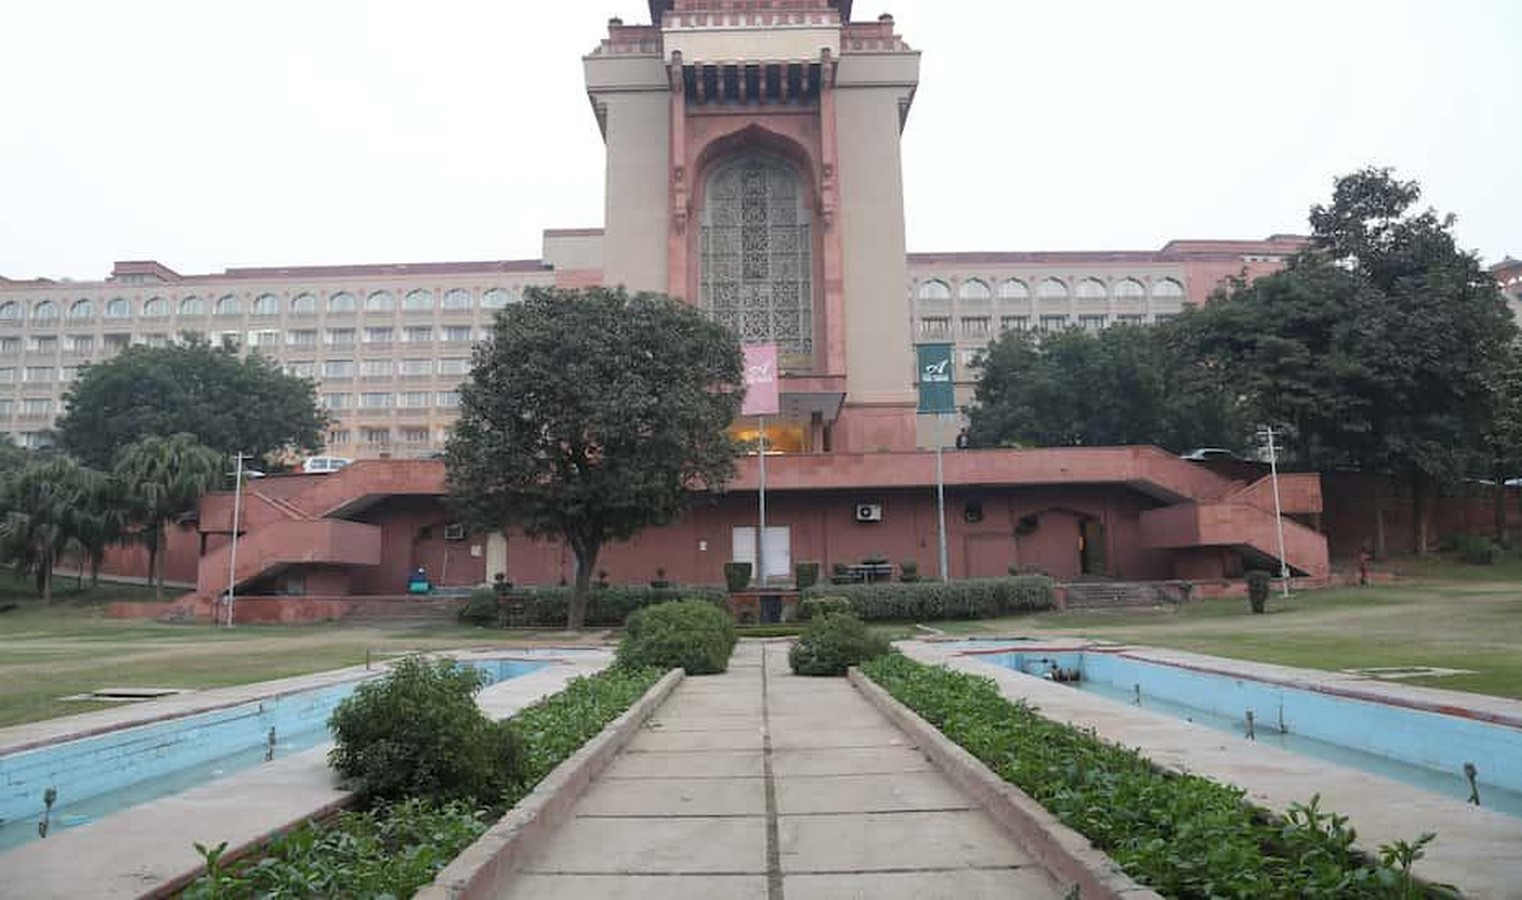 Ashoka Hotel by B E Doctor: Delhi's oldest 5-star hotel - Sheet3